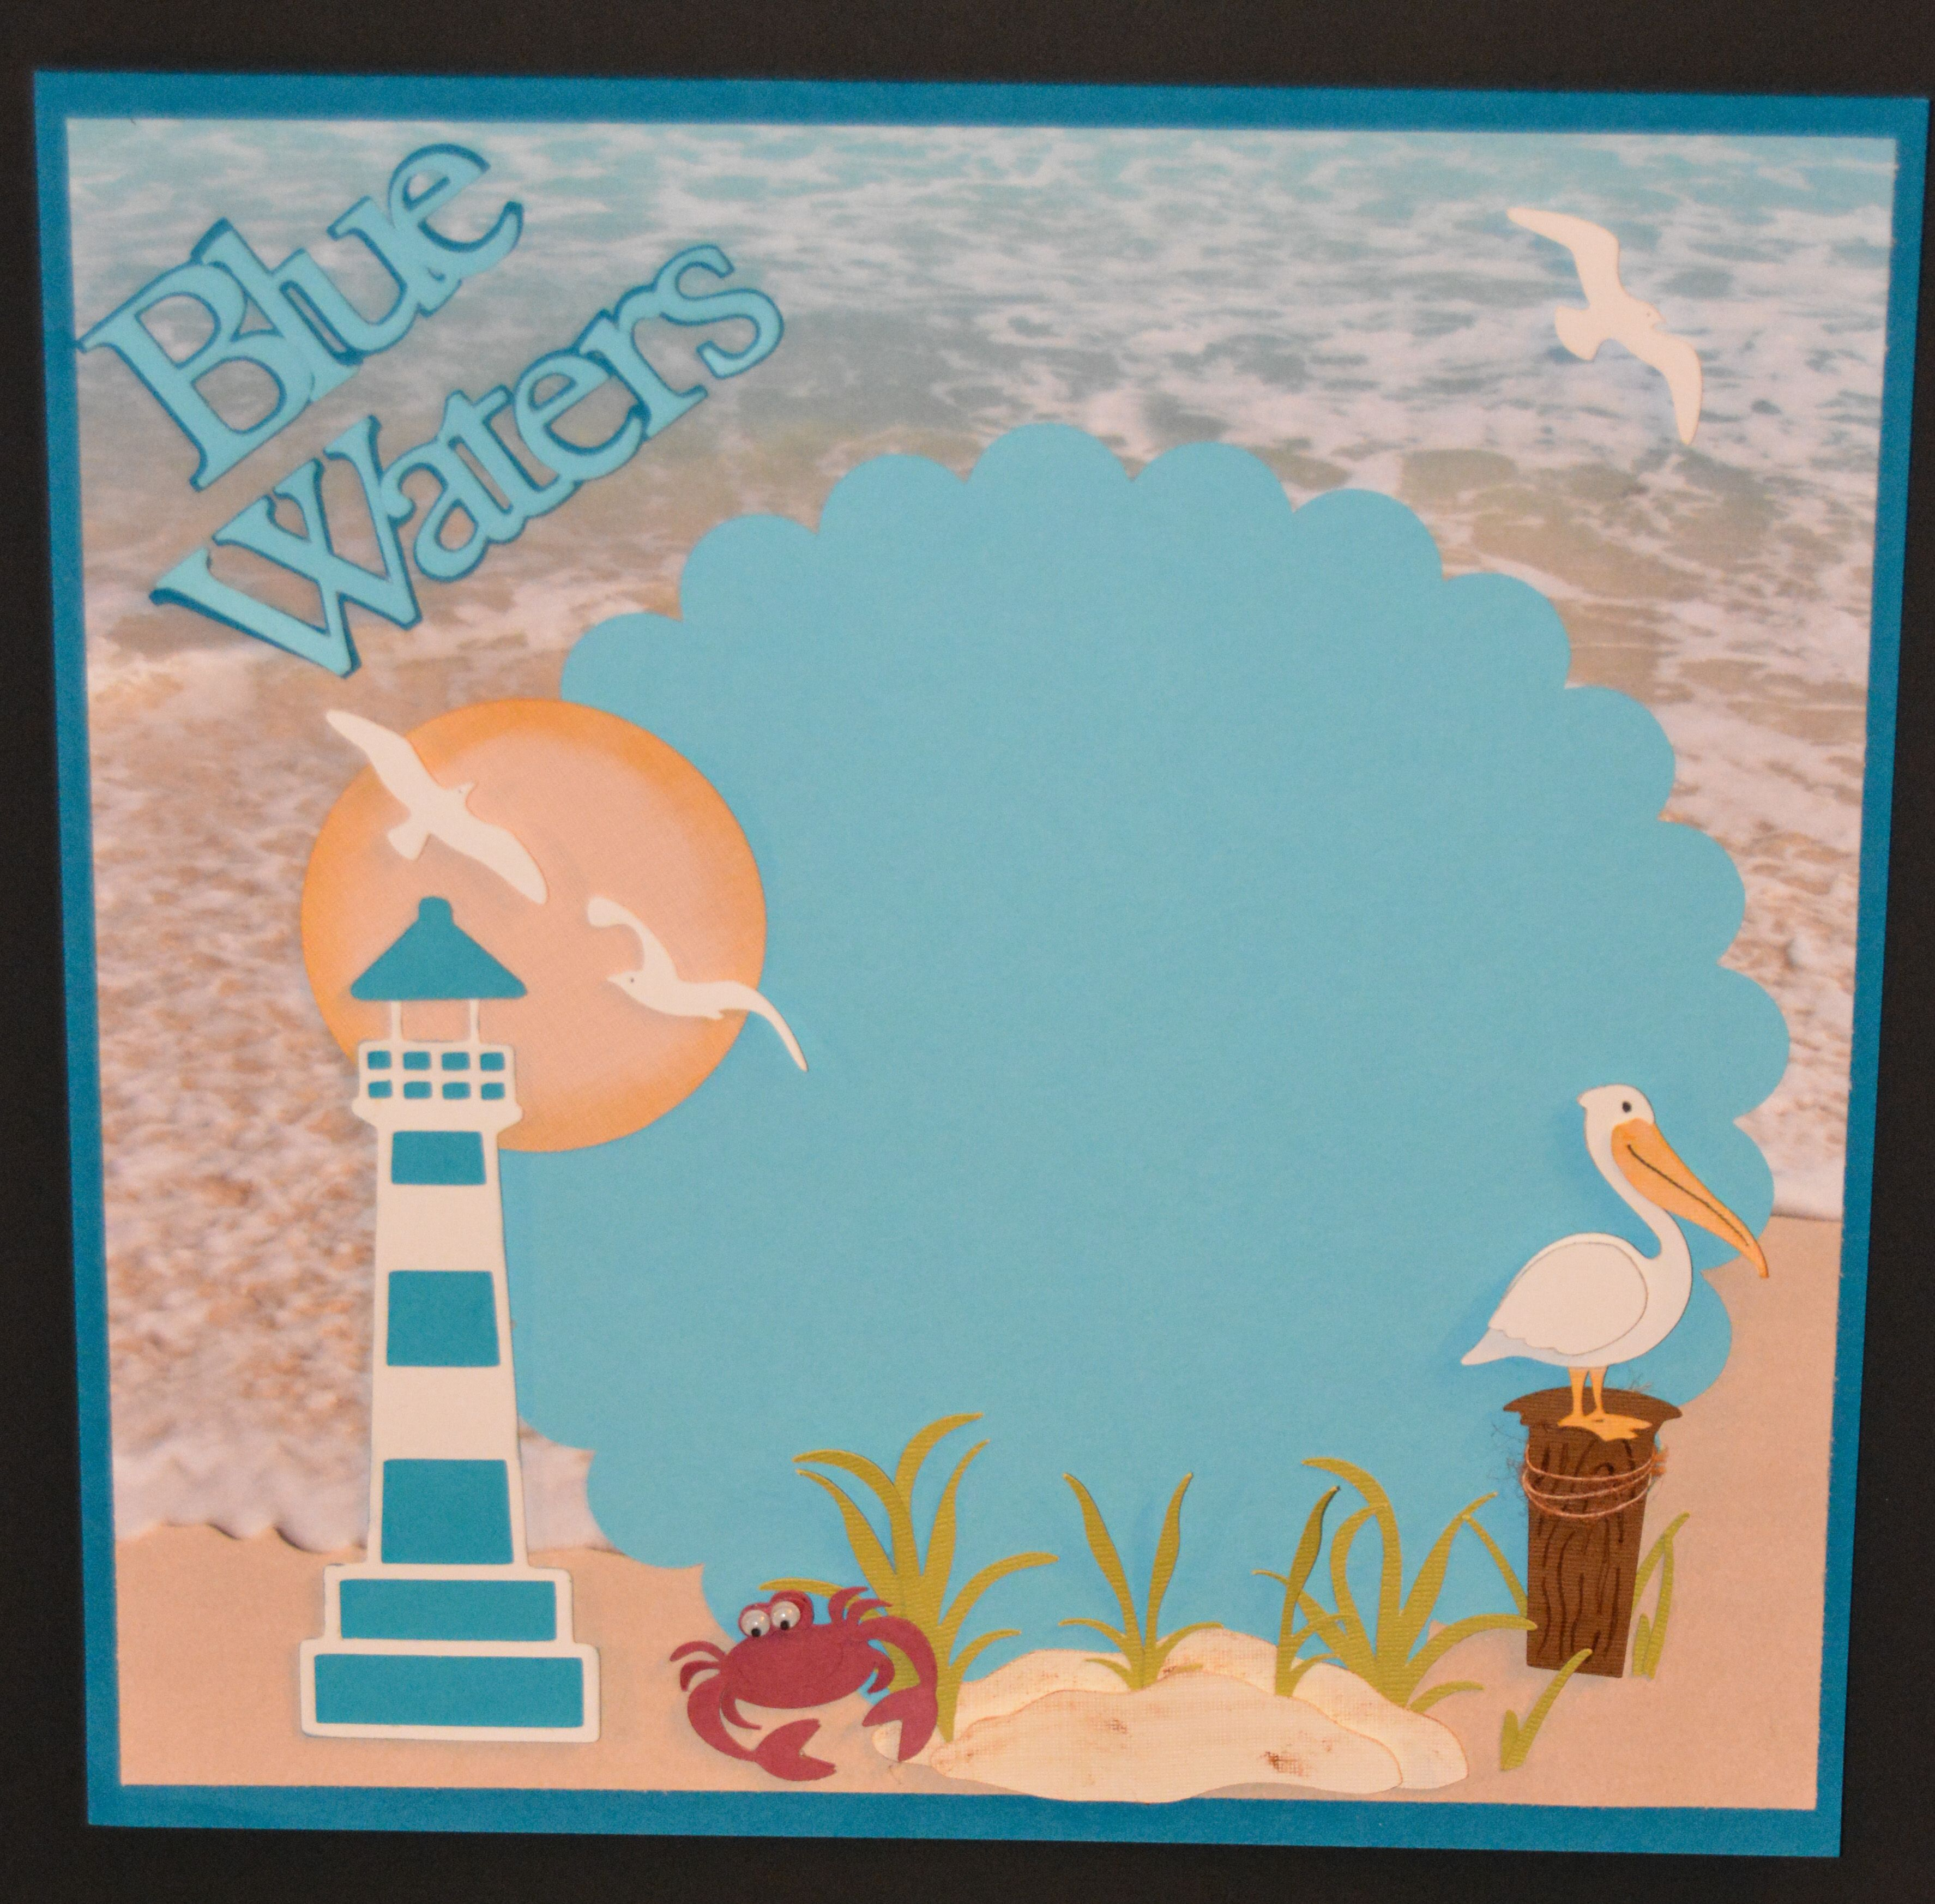 Scrapbook ideas list - Bucket List Item Seeing Blue Waters Used Cricut Life S A Beach Cartridge Bucket Listsscrapbook Layoutszoobucketscricut